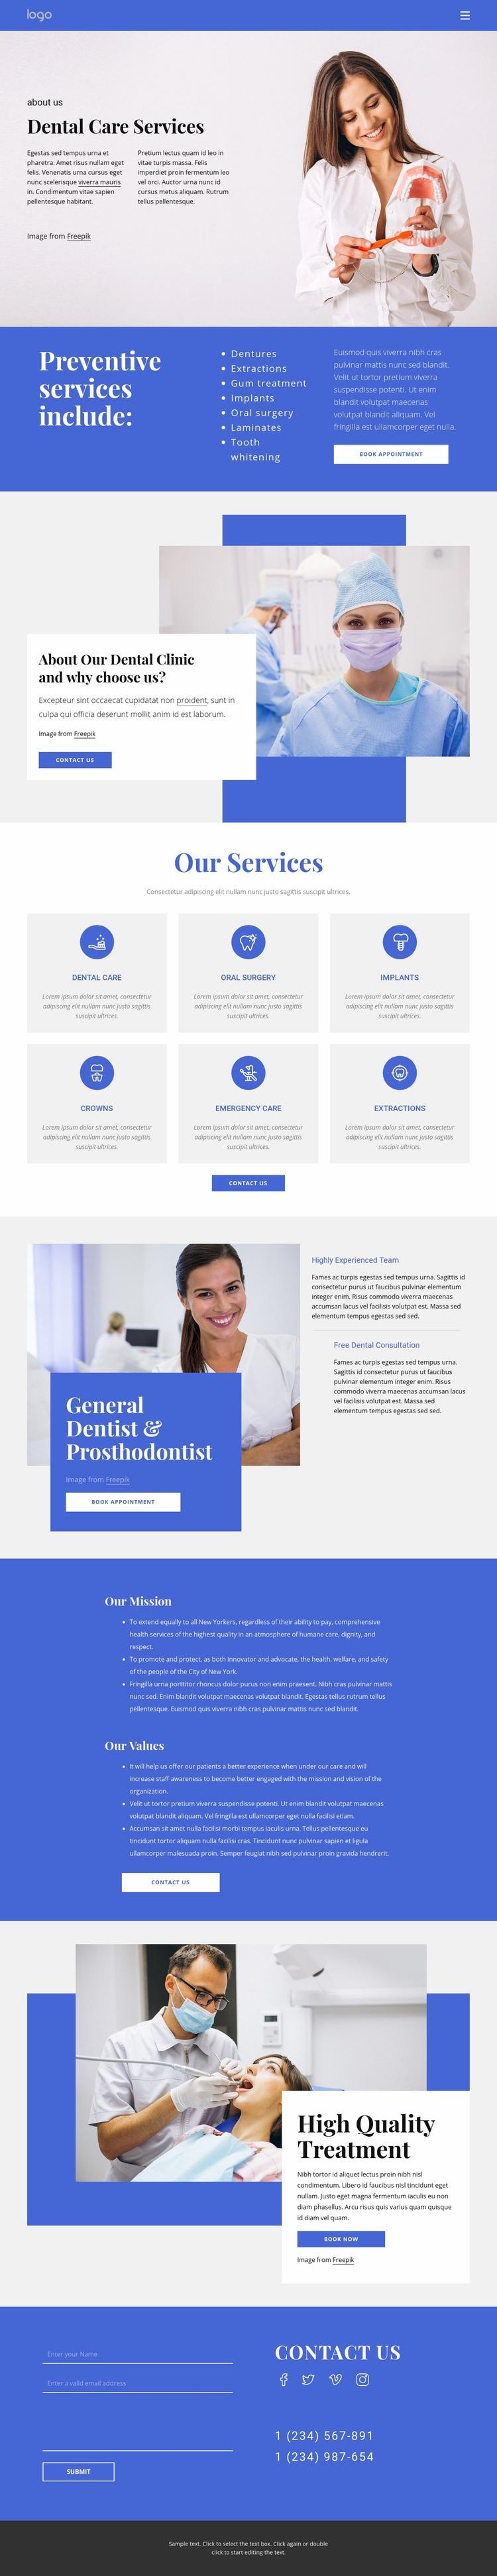 Dentist and prosthodontics Web Page Design